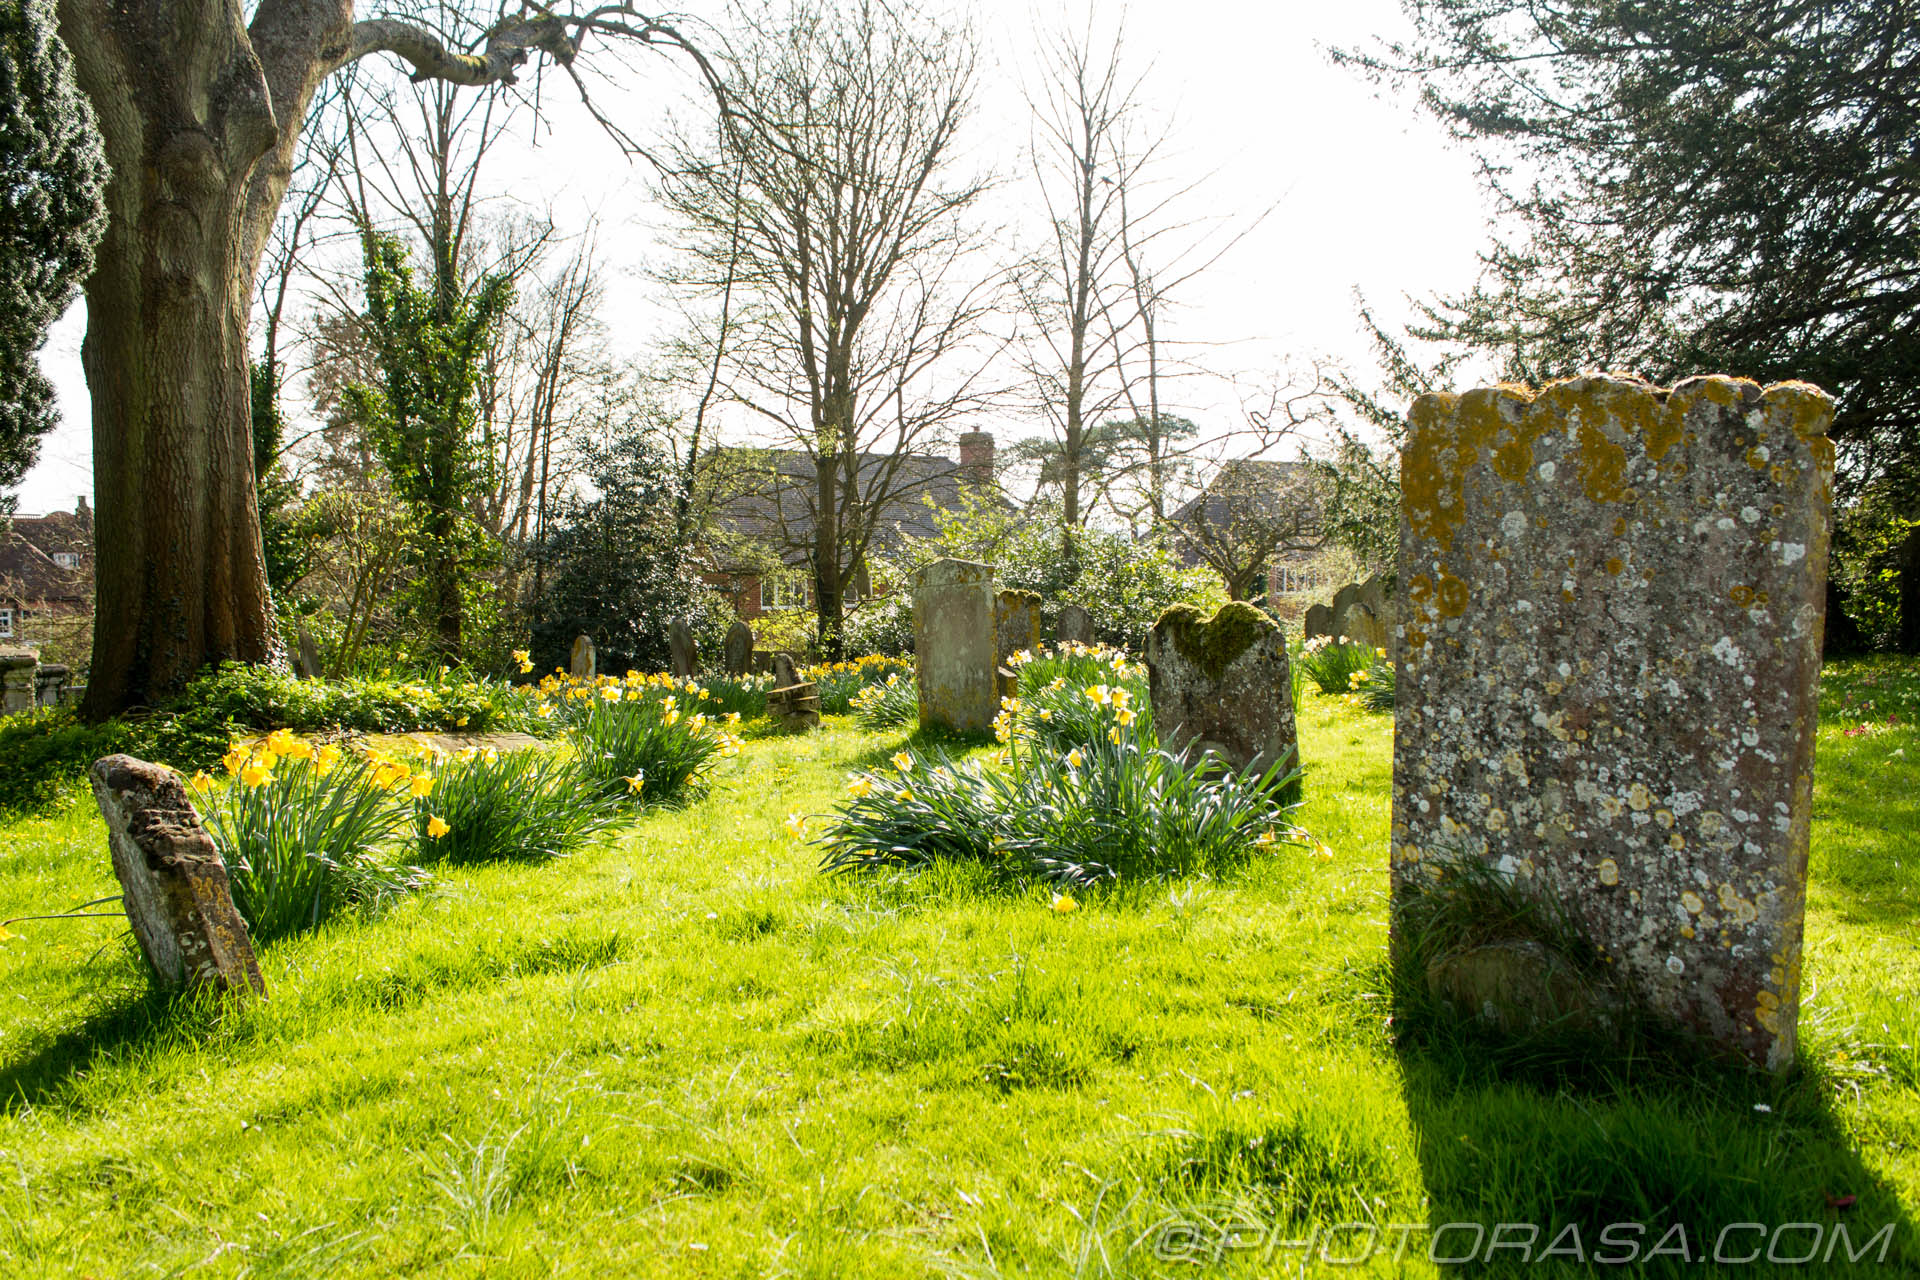 https://photorasa.com/saints-church-staplehurst-kent/yellow-church-daffs/